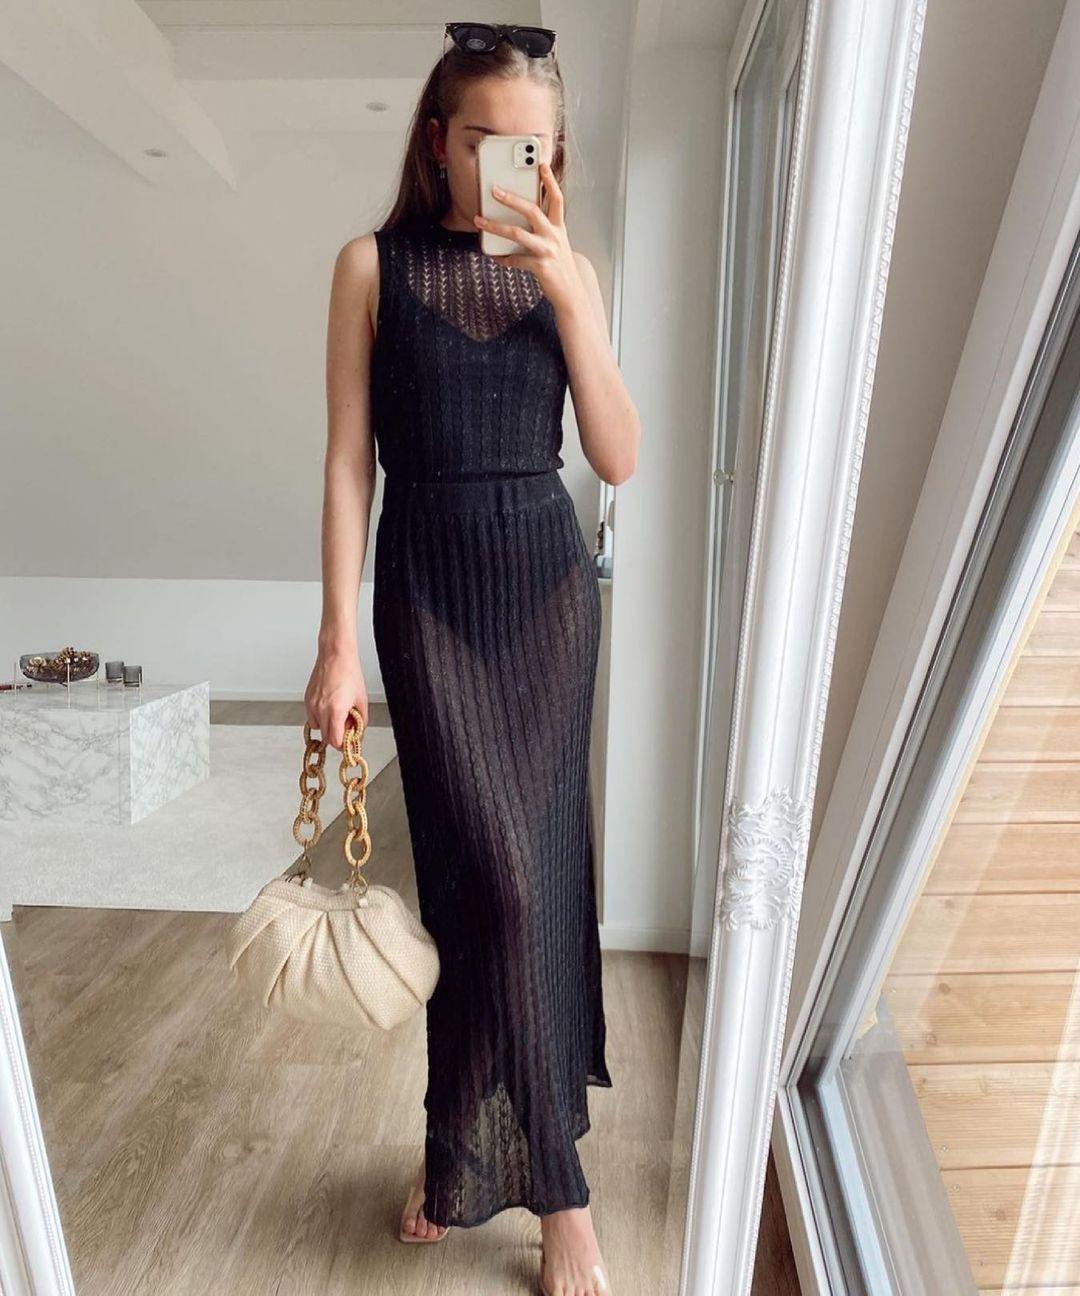 raffia shoulder bag de Zara sur zara.style.daily